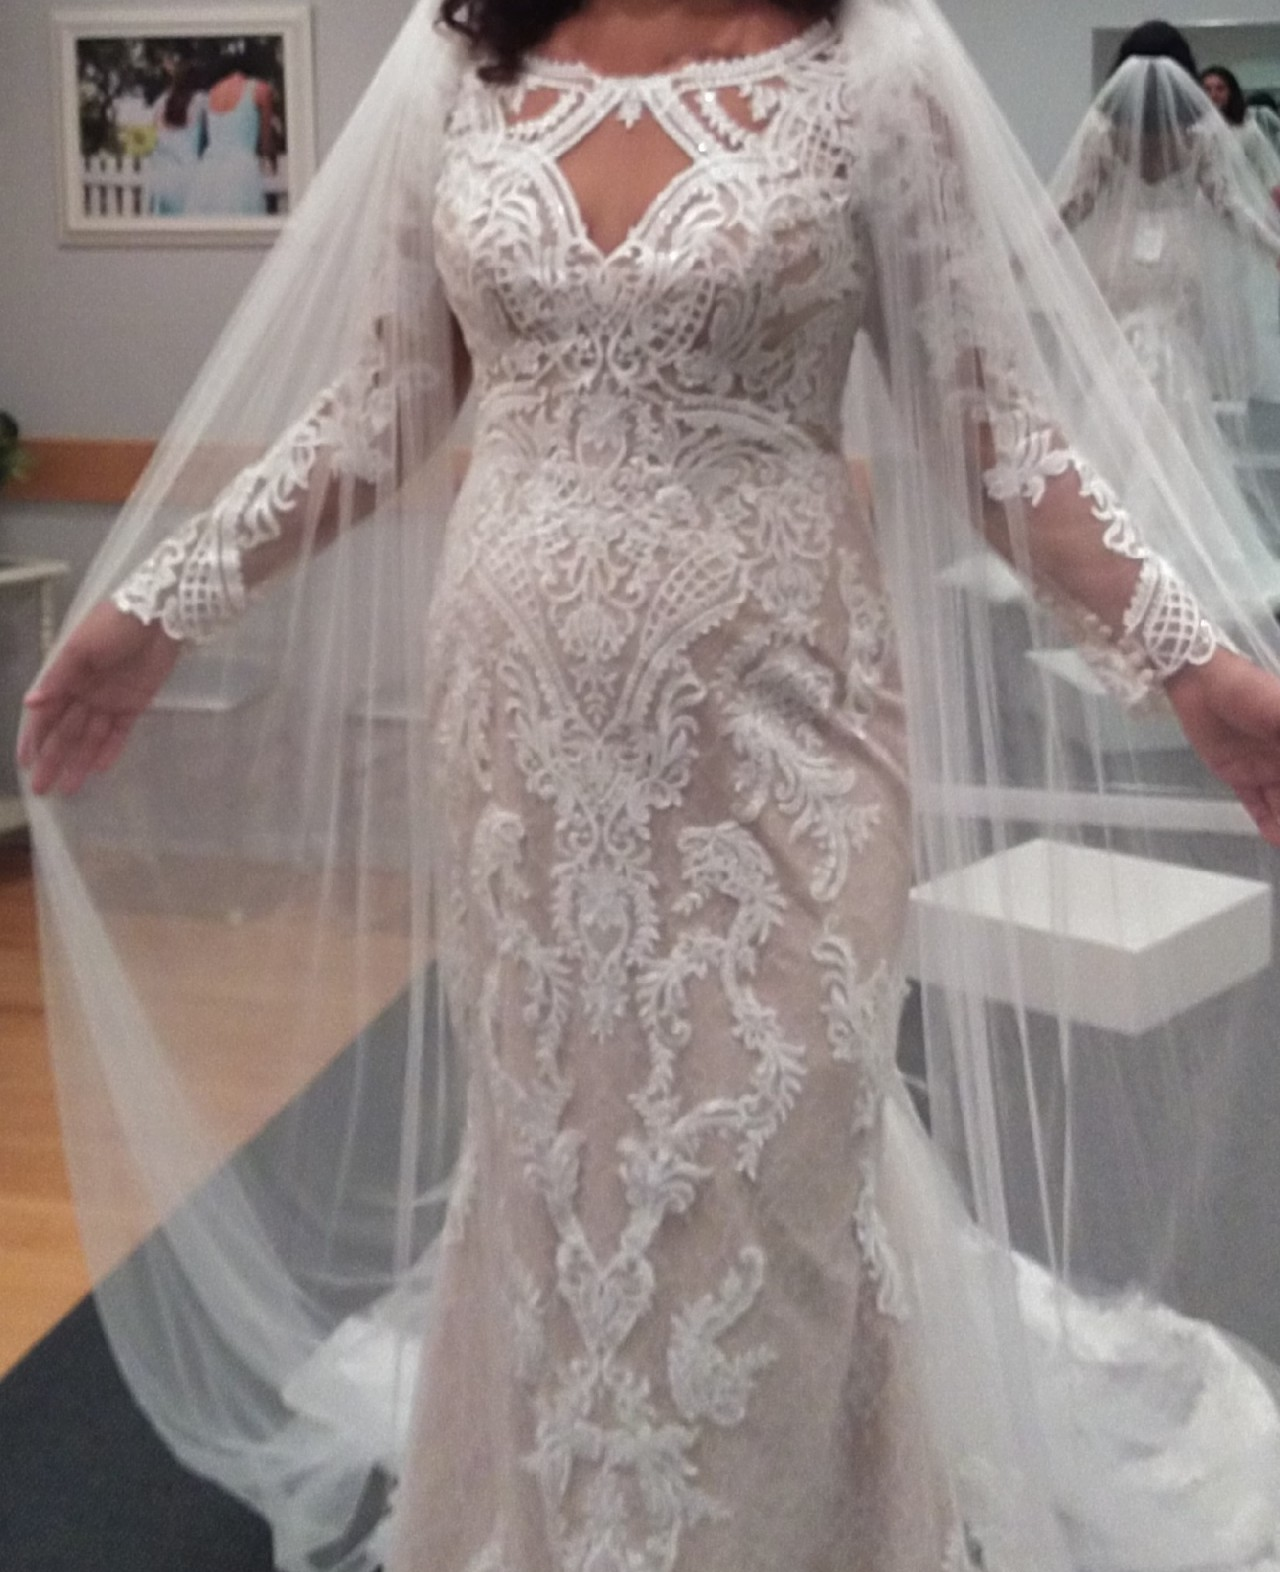 Cheap Wedding Dresses Mn: Maggie Sottero Cheyenne New Wedding Dress On Sale 24% Off